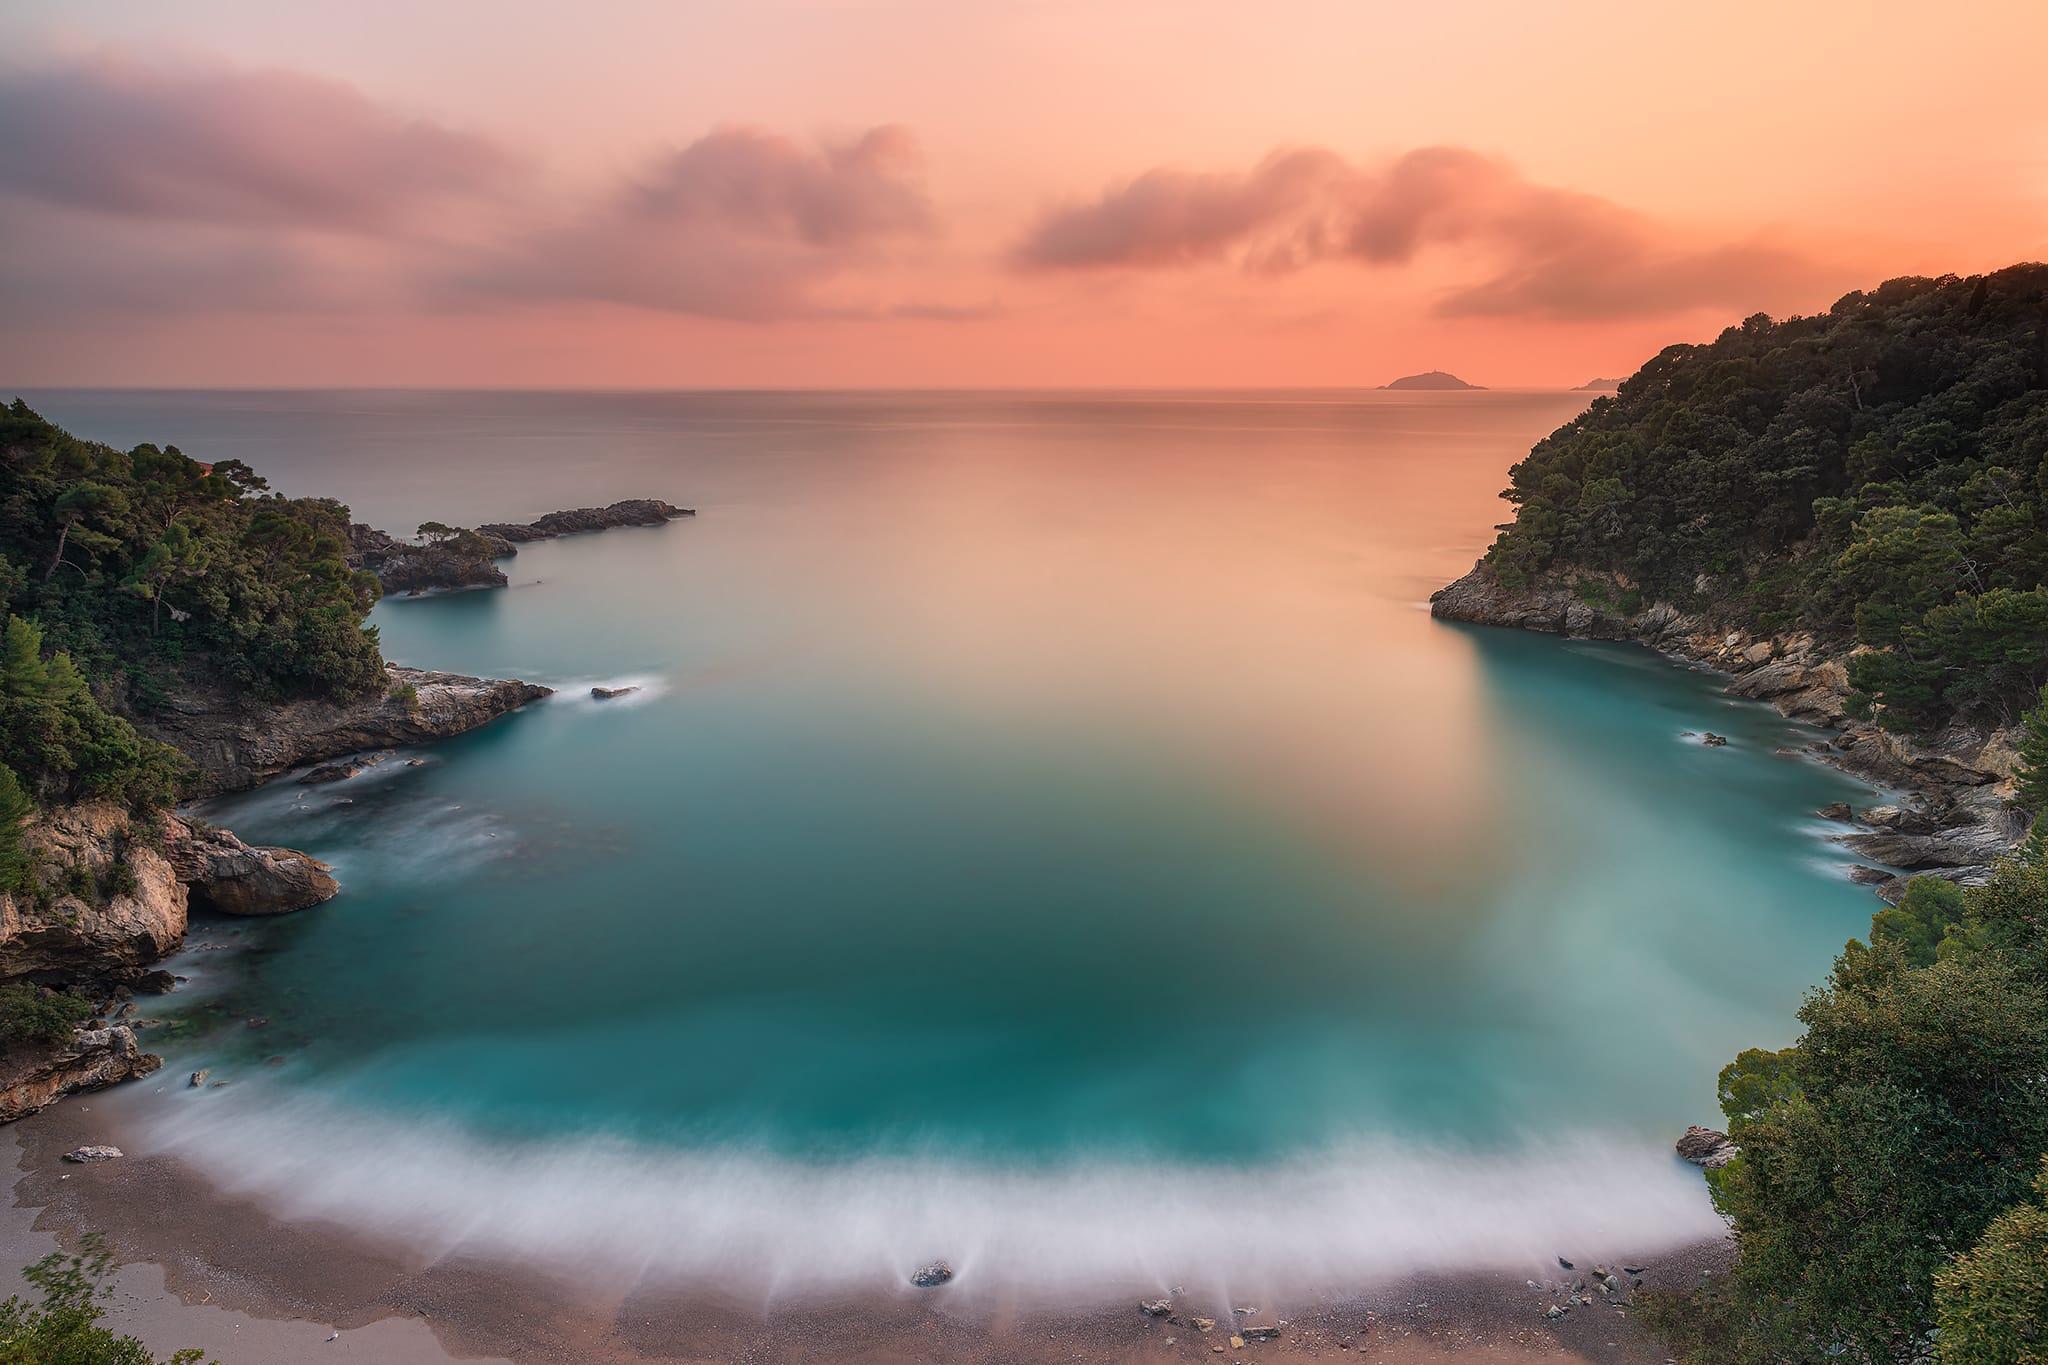 NiSi corso fotografico golfo dei poeti liguria tellaro lerici spezia portovenere